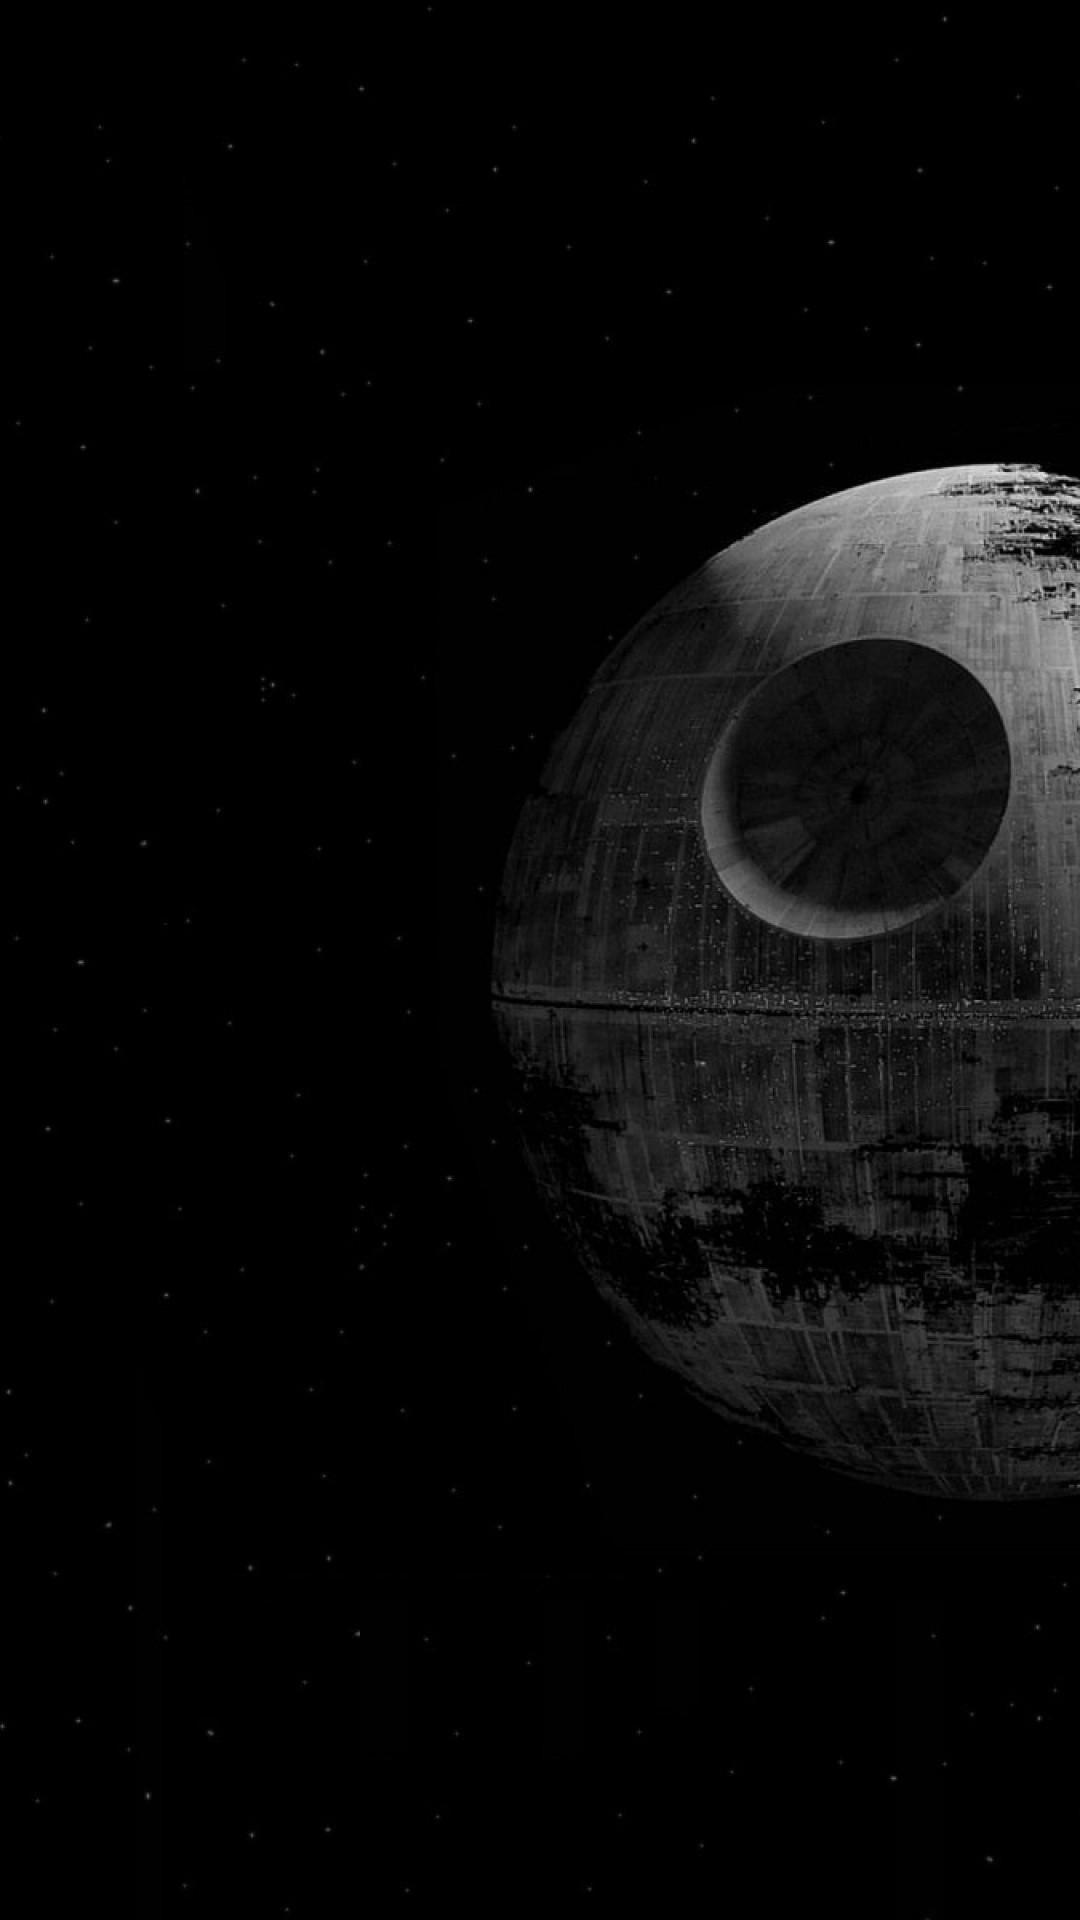 1080x1920 Death Star Wallpaper 74 Death Star Wallpaper 4k 1080x1920 Download Hd Wallpaper Wallpapertip